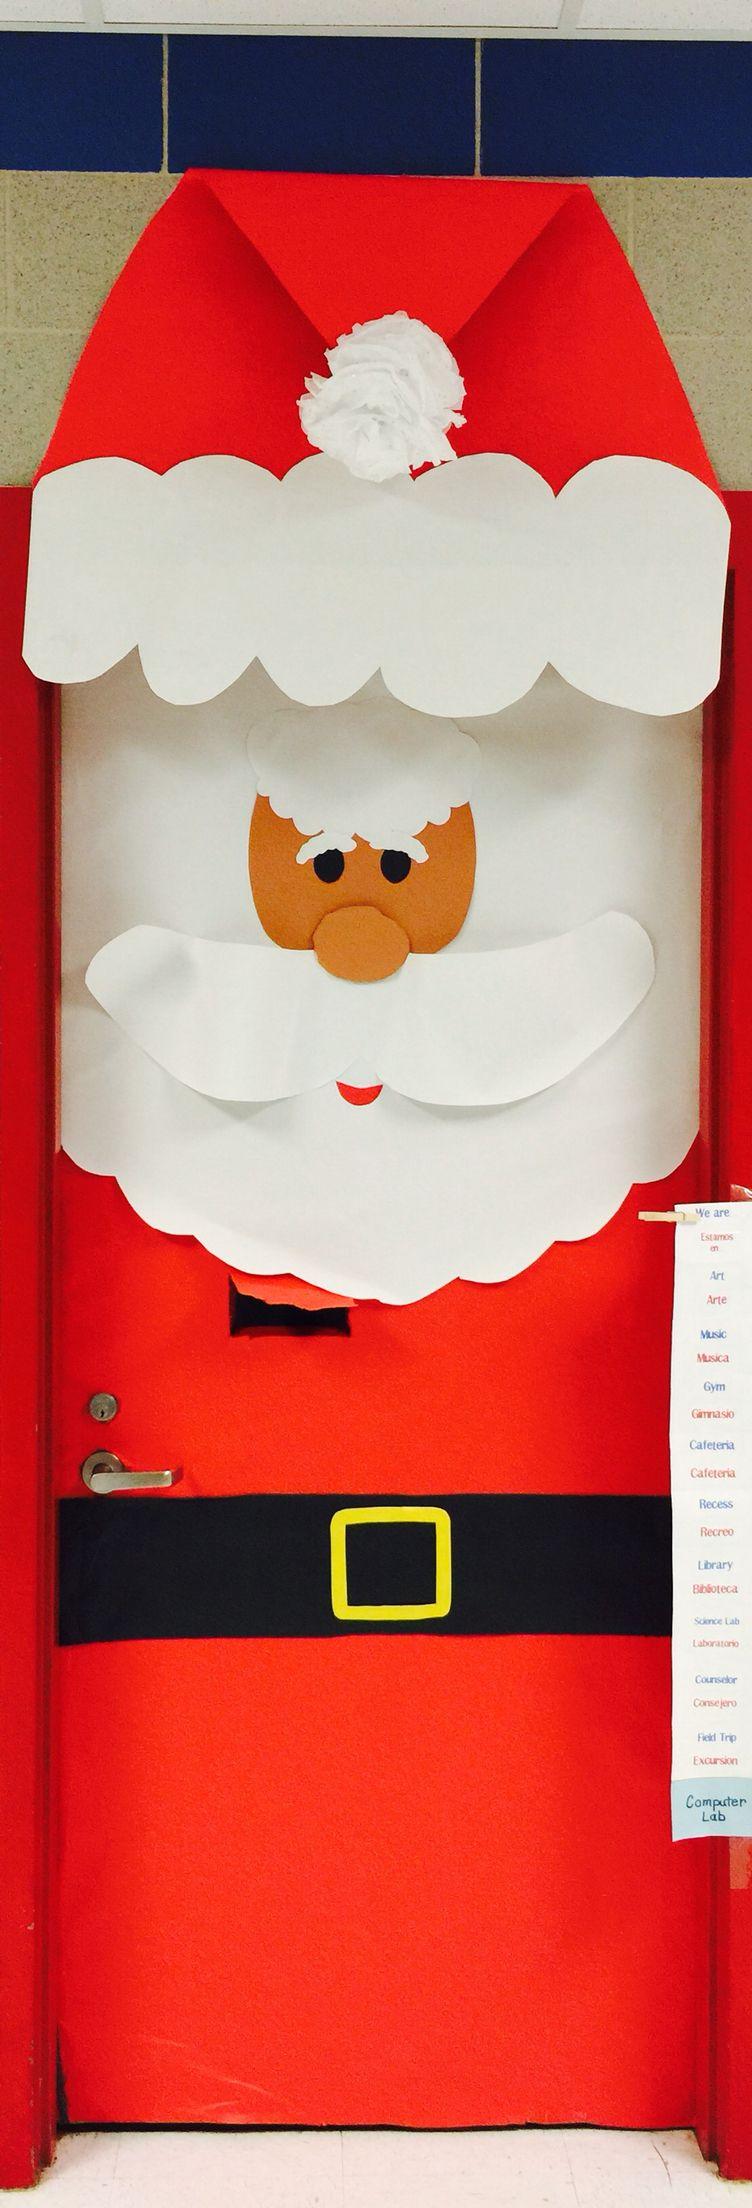 Papa Noel Santa Claus Santa Door Puerta Navidena Christmas Door Christmas Door Decorations Easy Christmas Decorations